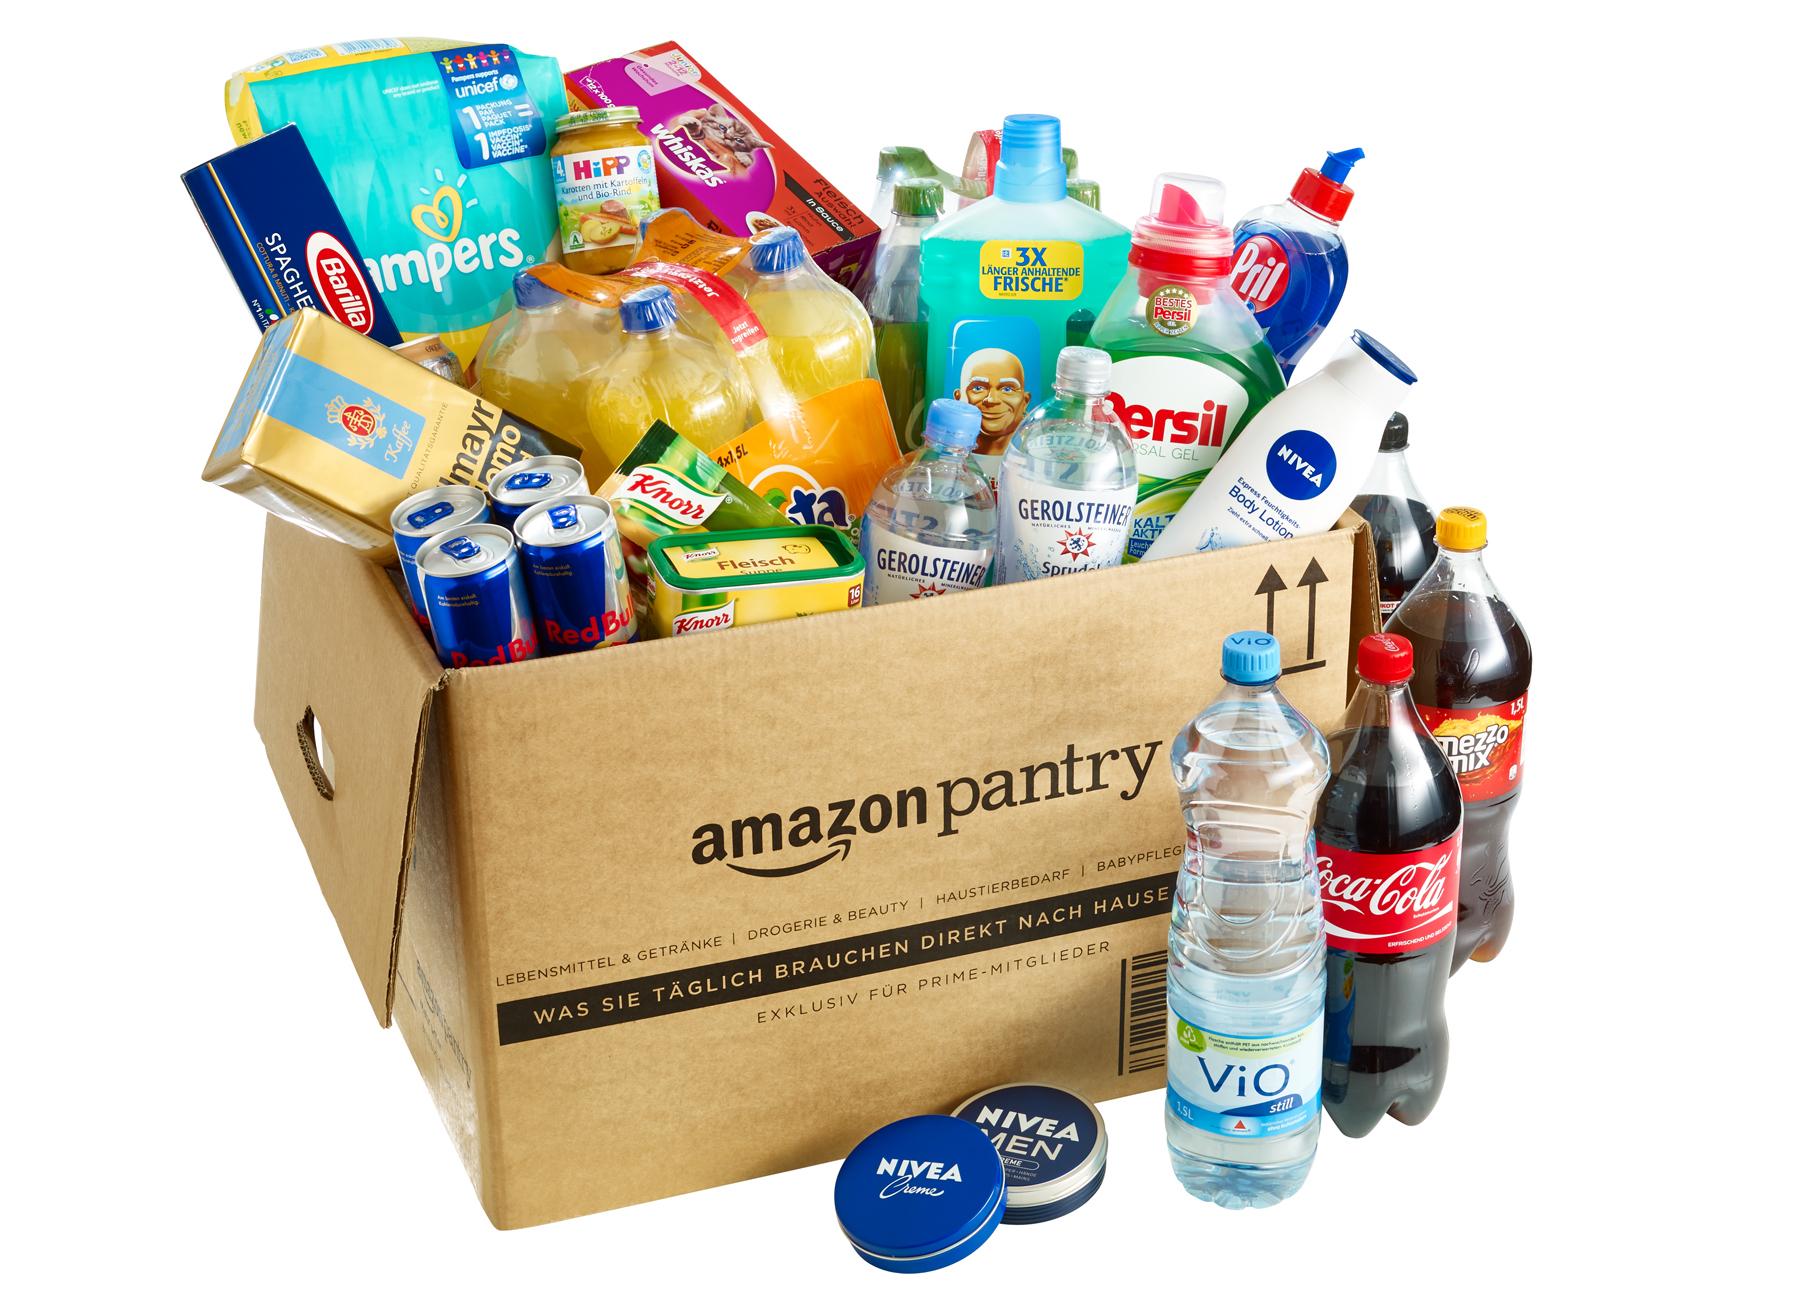 5€ GRATIS para Amazon Pantry con cualquier oferta Prime Day